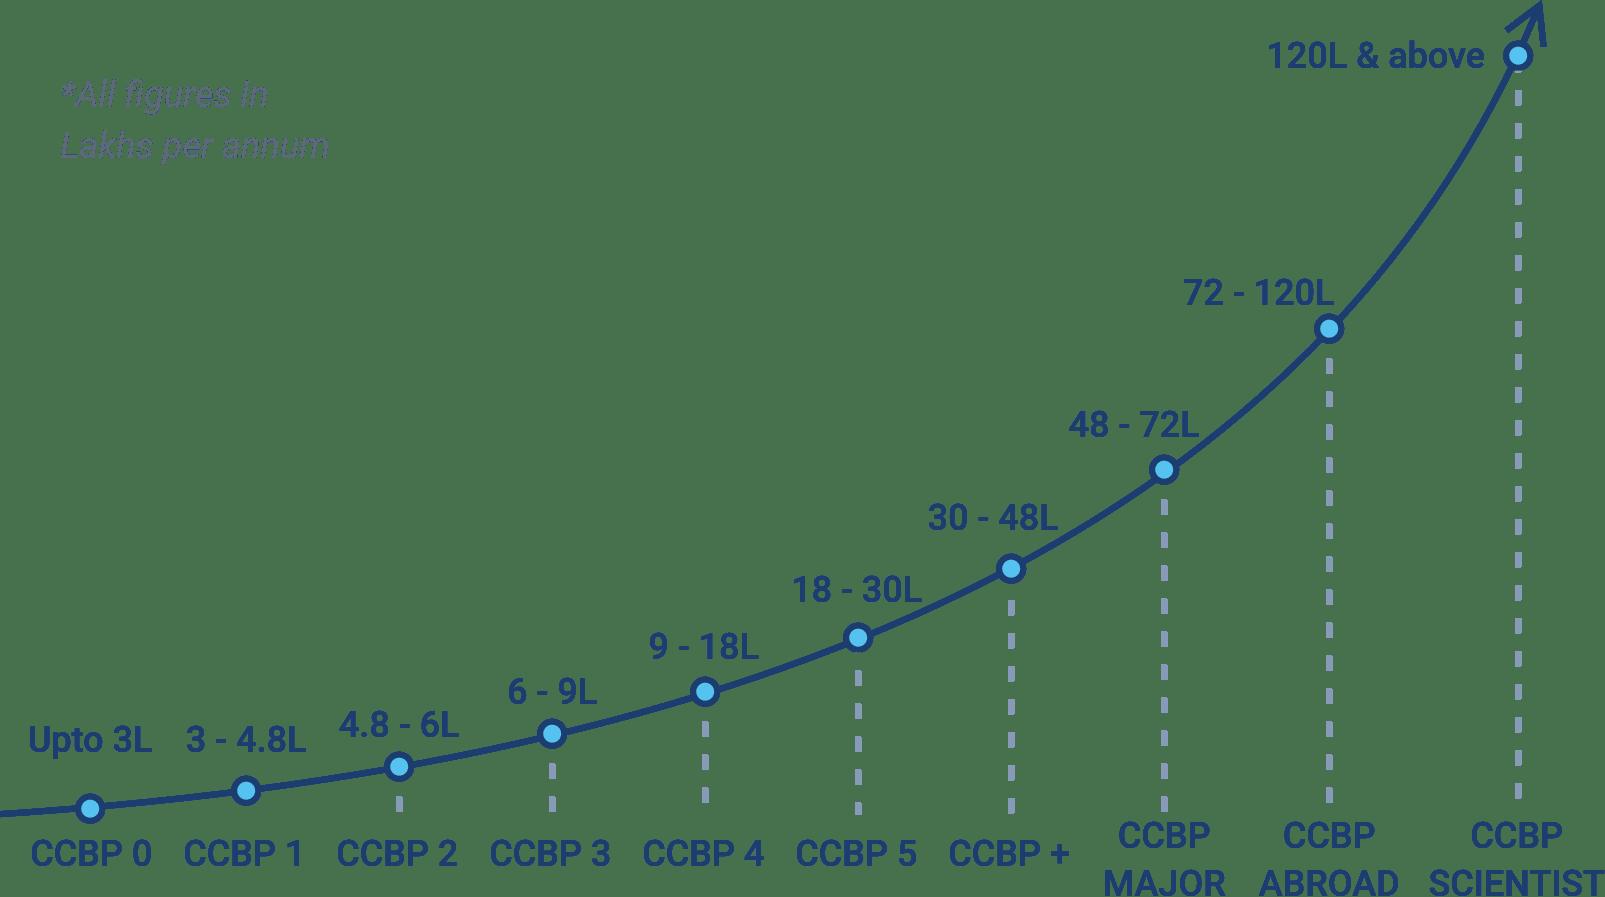 ccbp progress graph